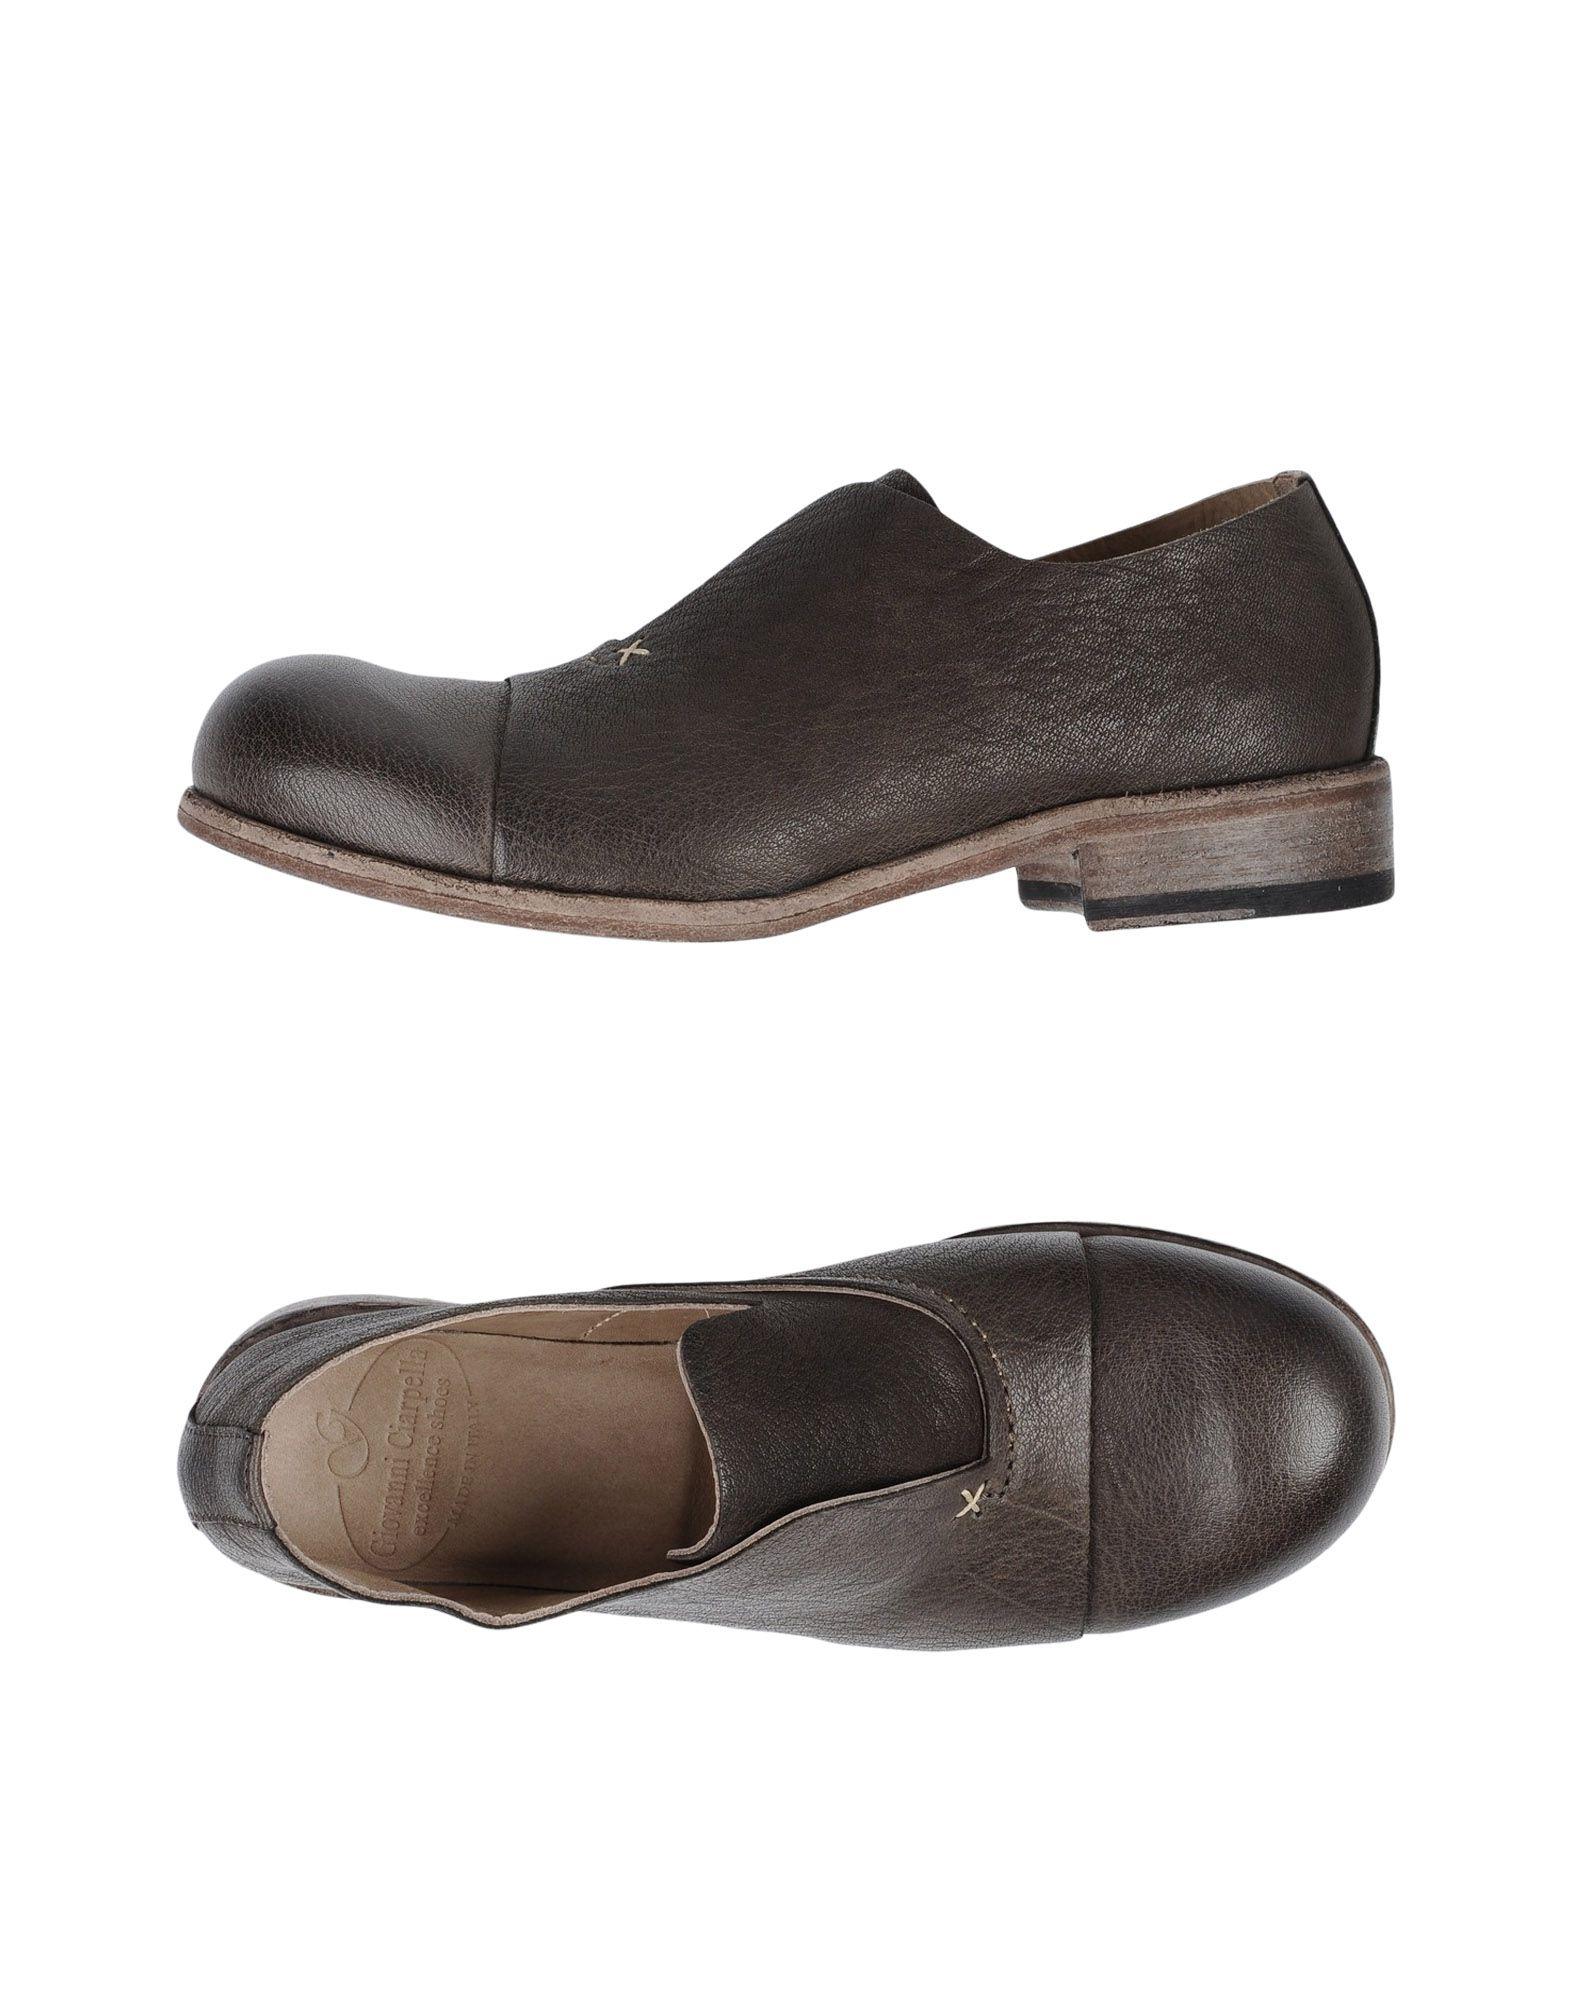 GIOVANNI CIARPELLA Zapatos de cordones mujer wQUKYTa